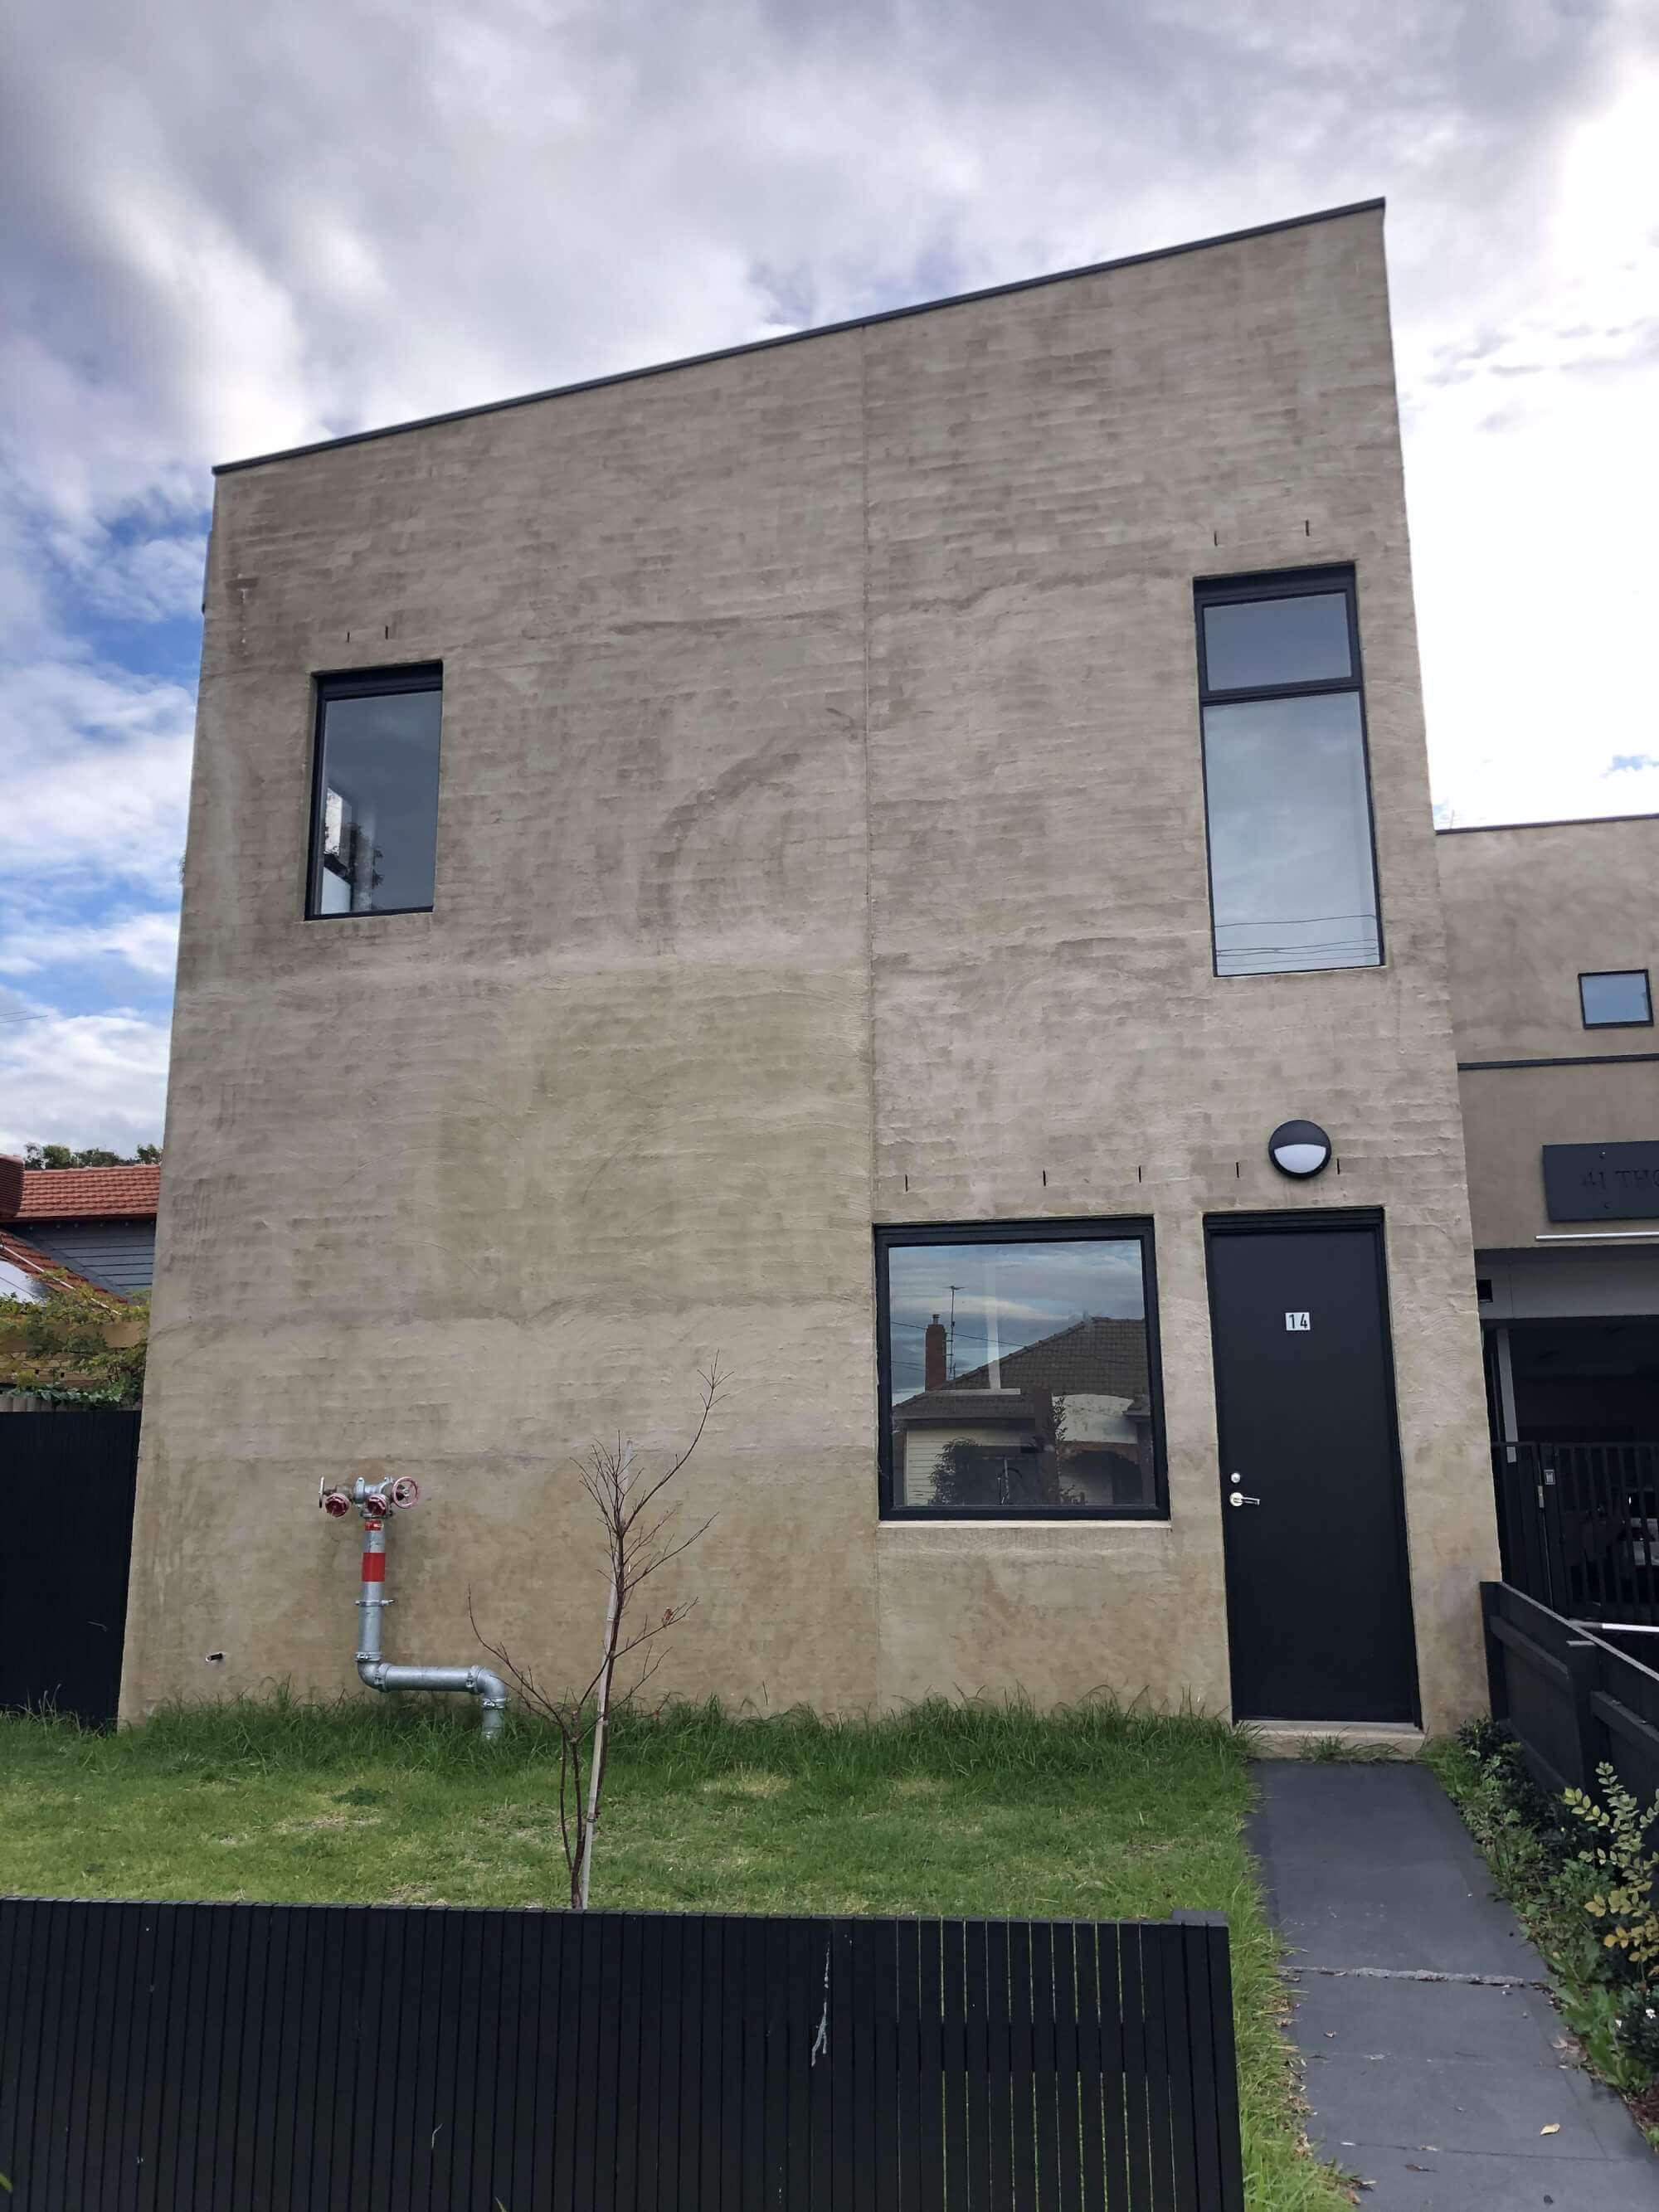 14/41 Thomson Street Maidstone VIC 3012